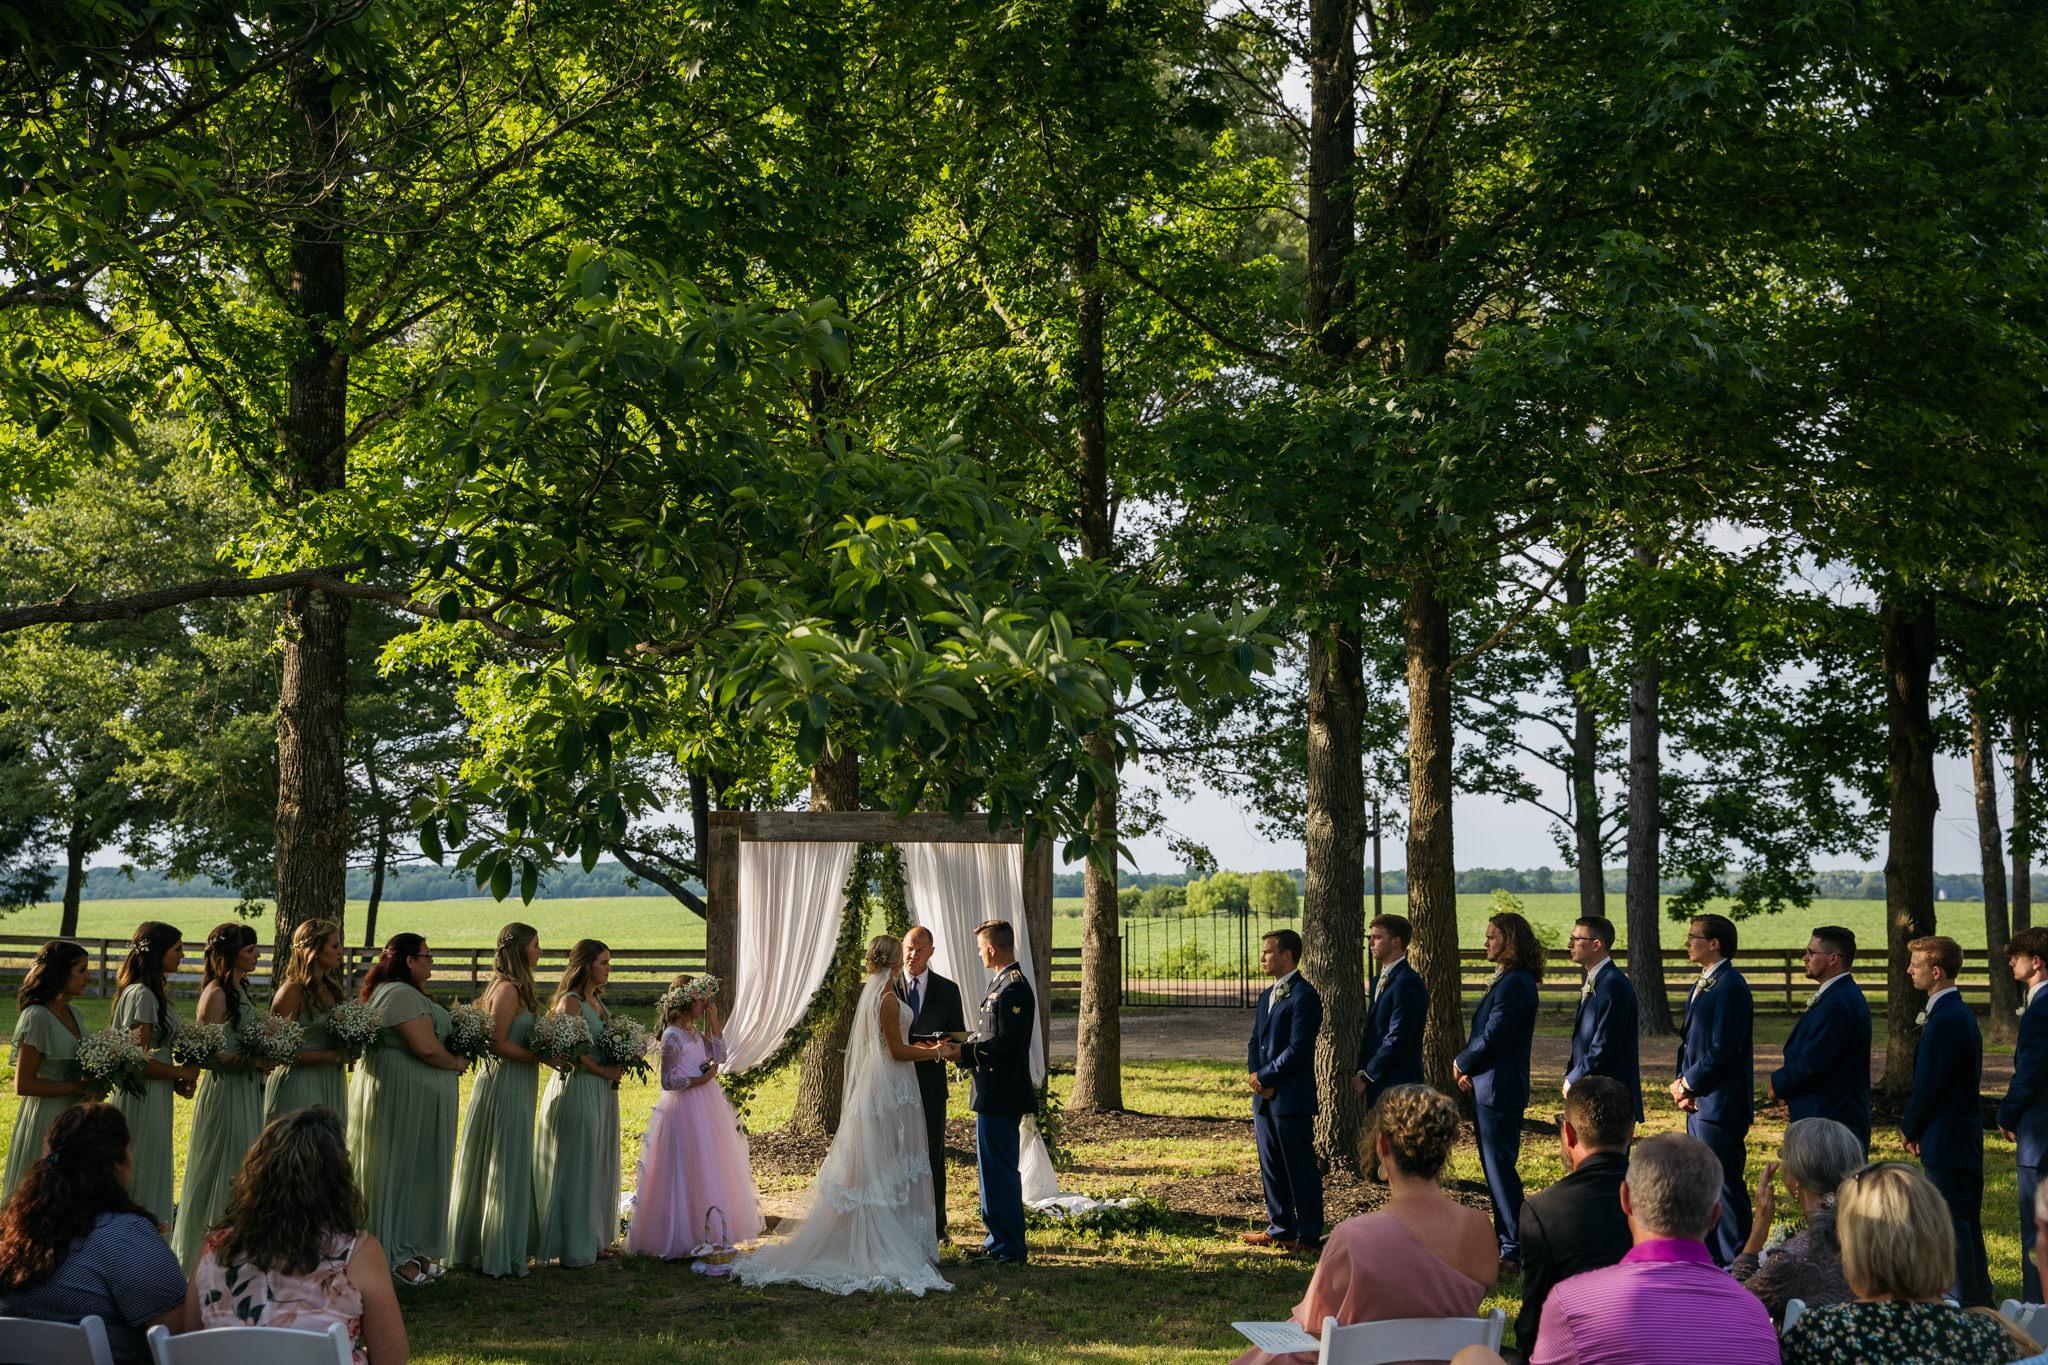 backyard-wedding-thewarmtharoundyou-lexy-branson-52.jpg